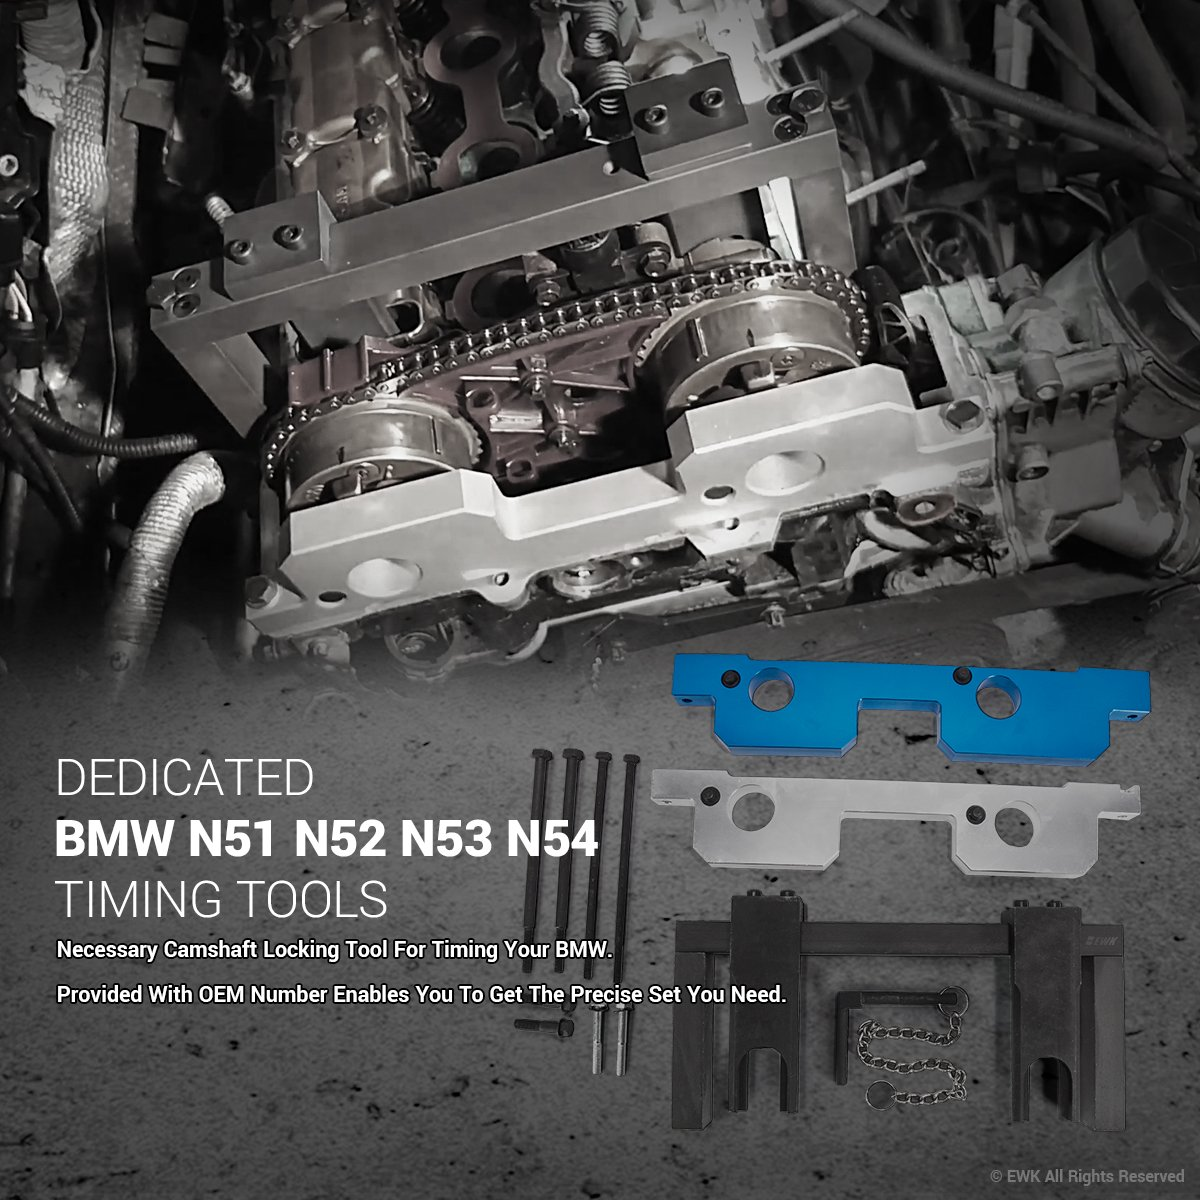 Ewk Engine Timing Cam Camshaft Alignment Locking Tool Bmw 325i Chain Kit For N51 N52 N53 N54 110300 114280 114290 118520 Automotive